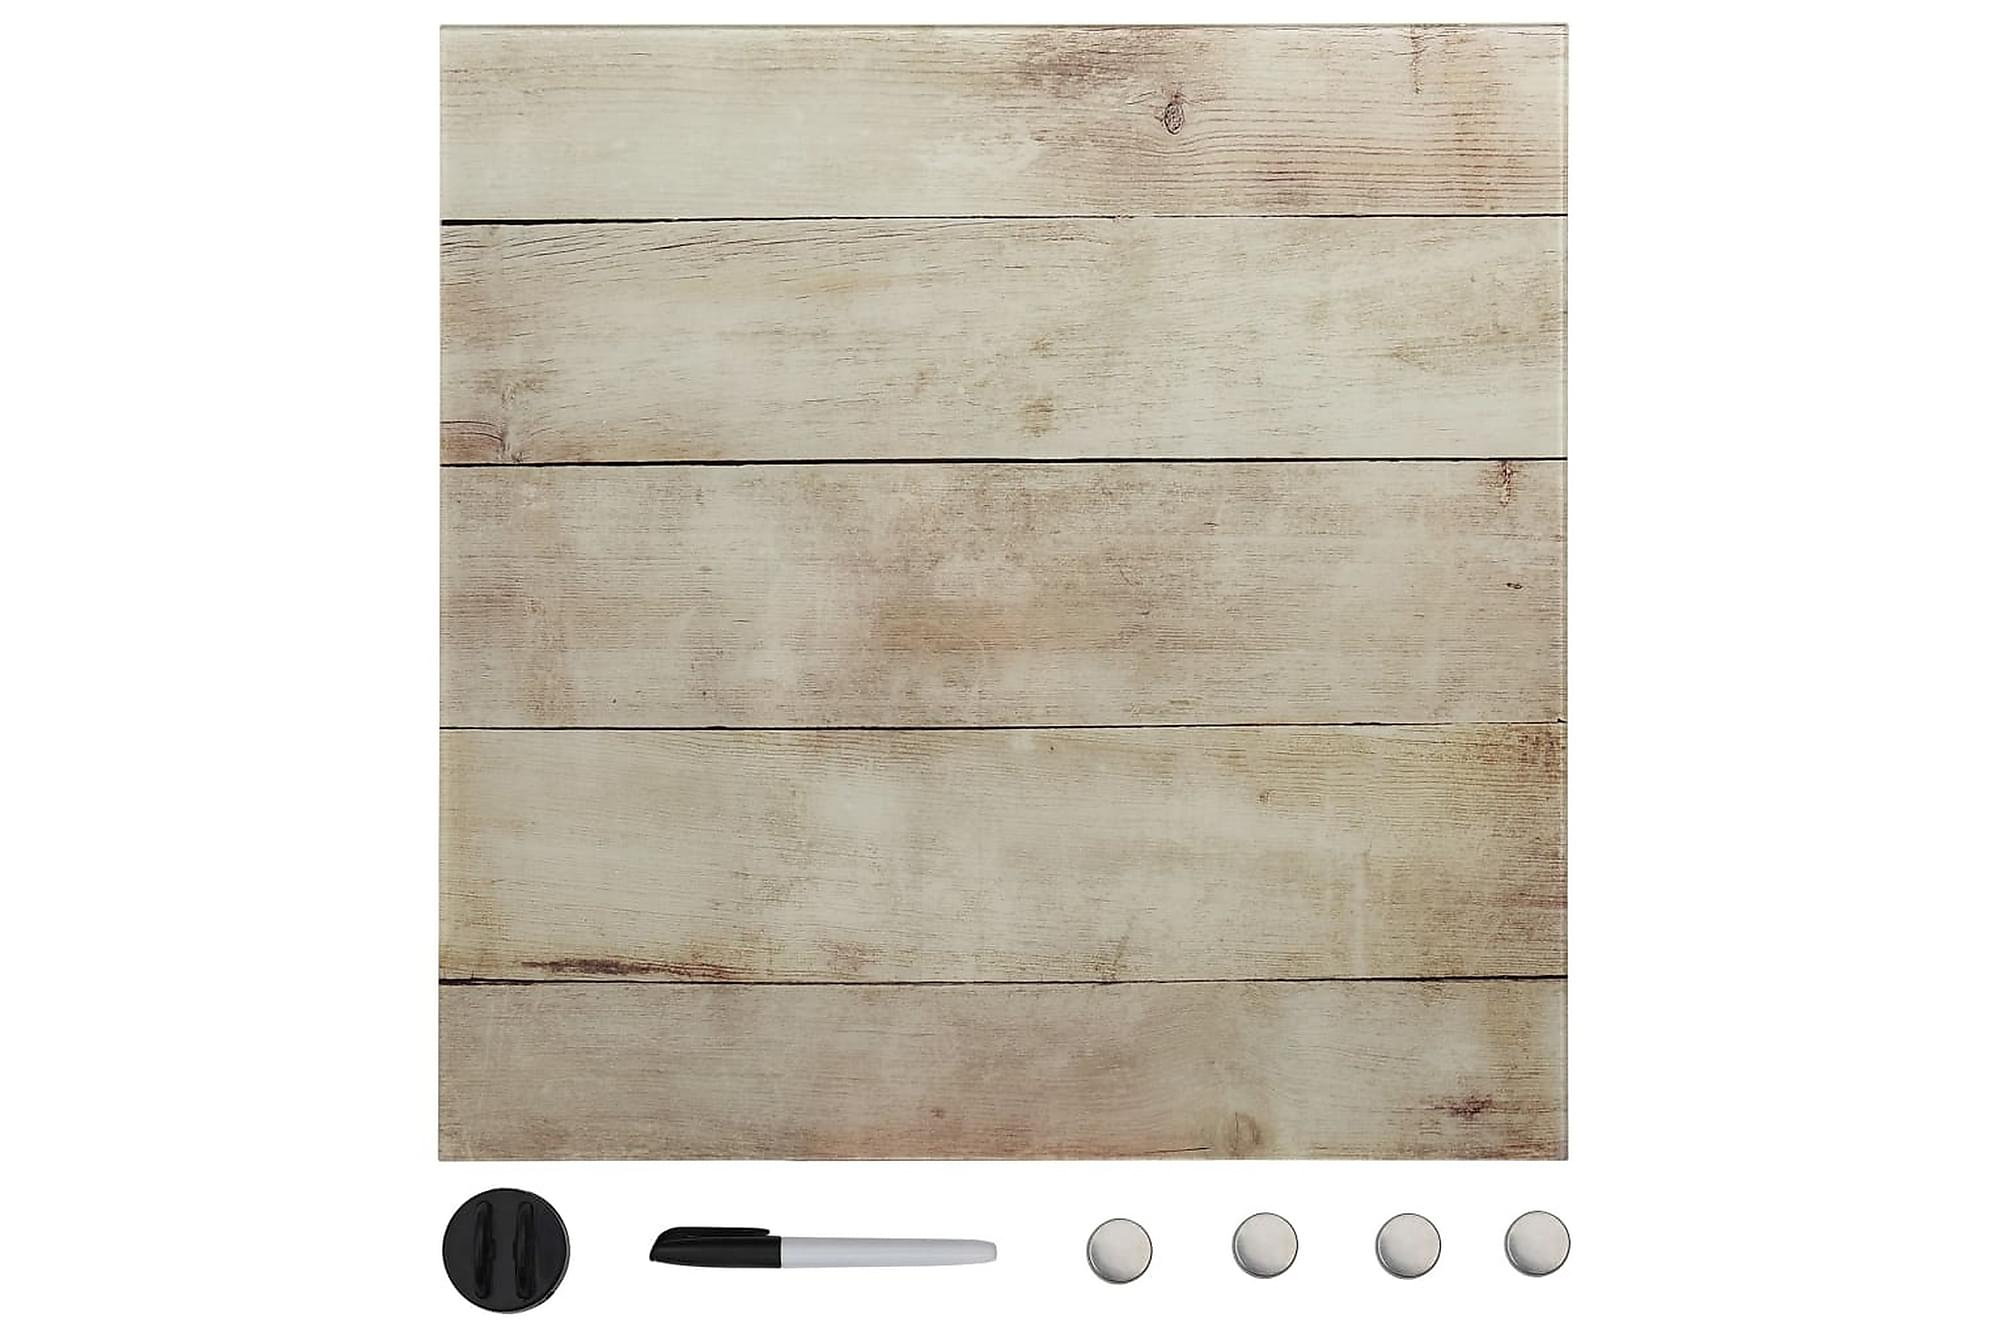 Magnetisk glastavla väggmonterad 50x50 cm, Whiteboards & griffeltavlor